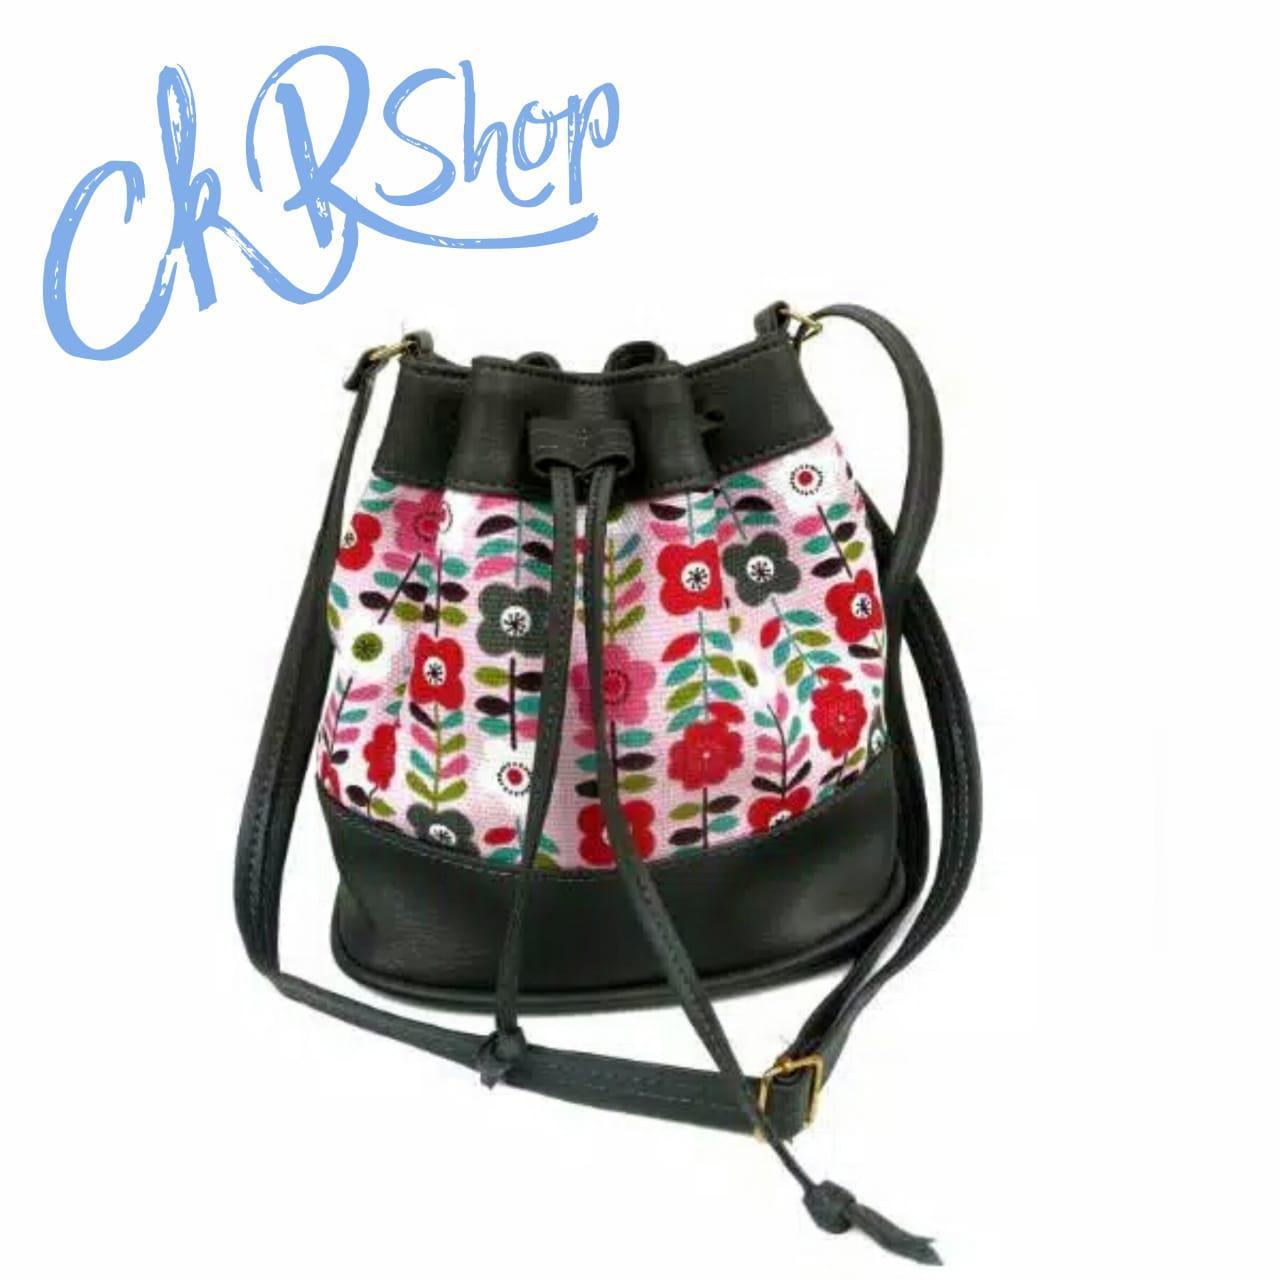 CKR Shop - Tas Selempang Wanita / Tas Serut Bandul / Tas Motif Bunga Haruno Sakura